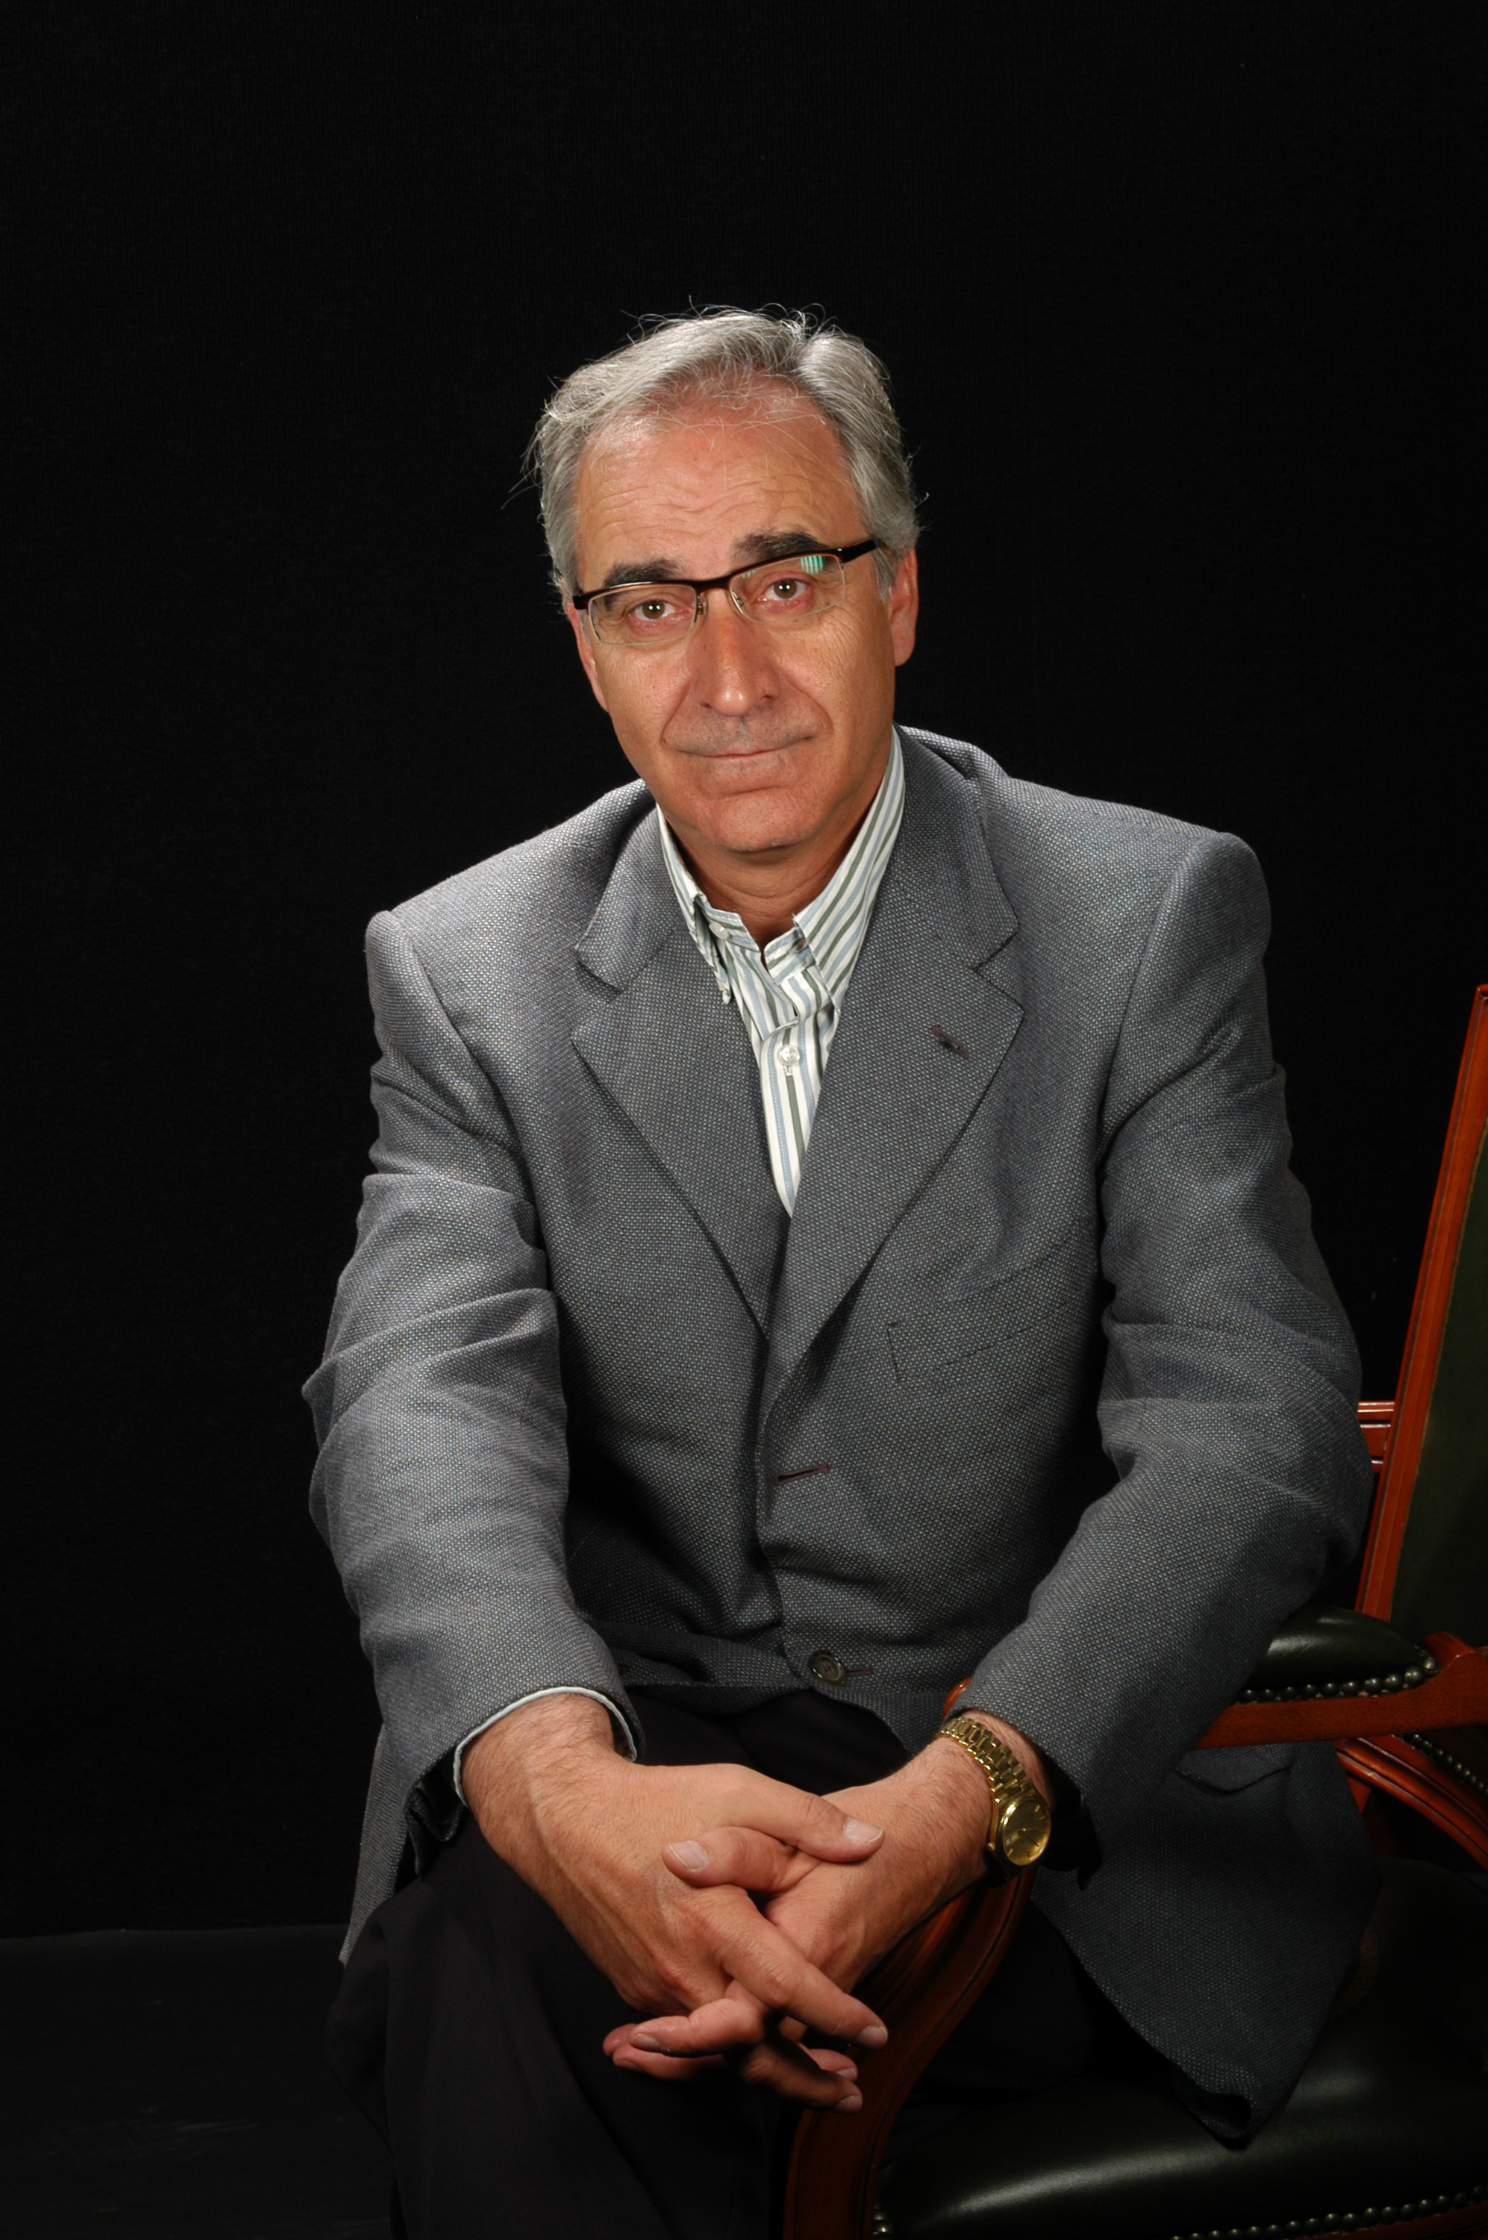 Sr. Ramon Palau Sol